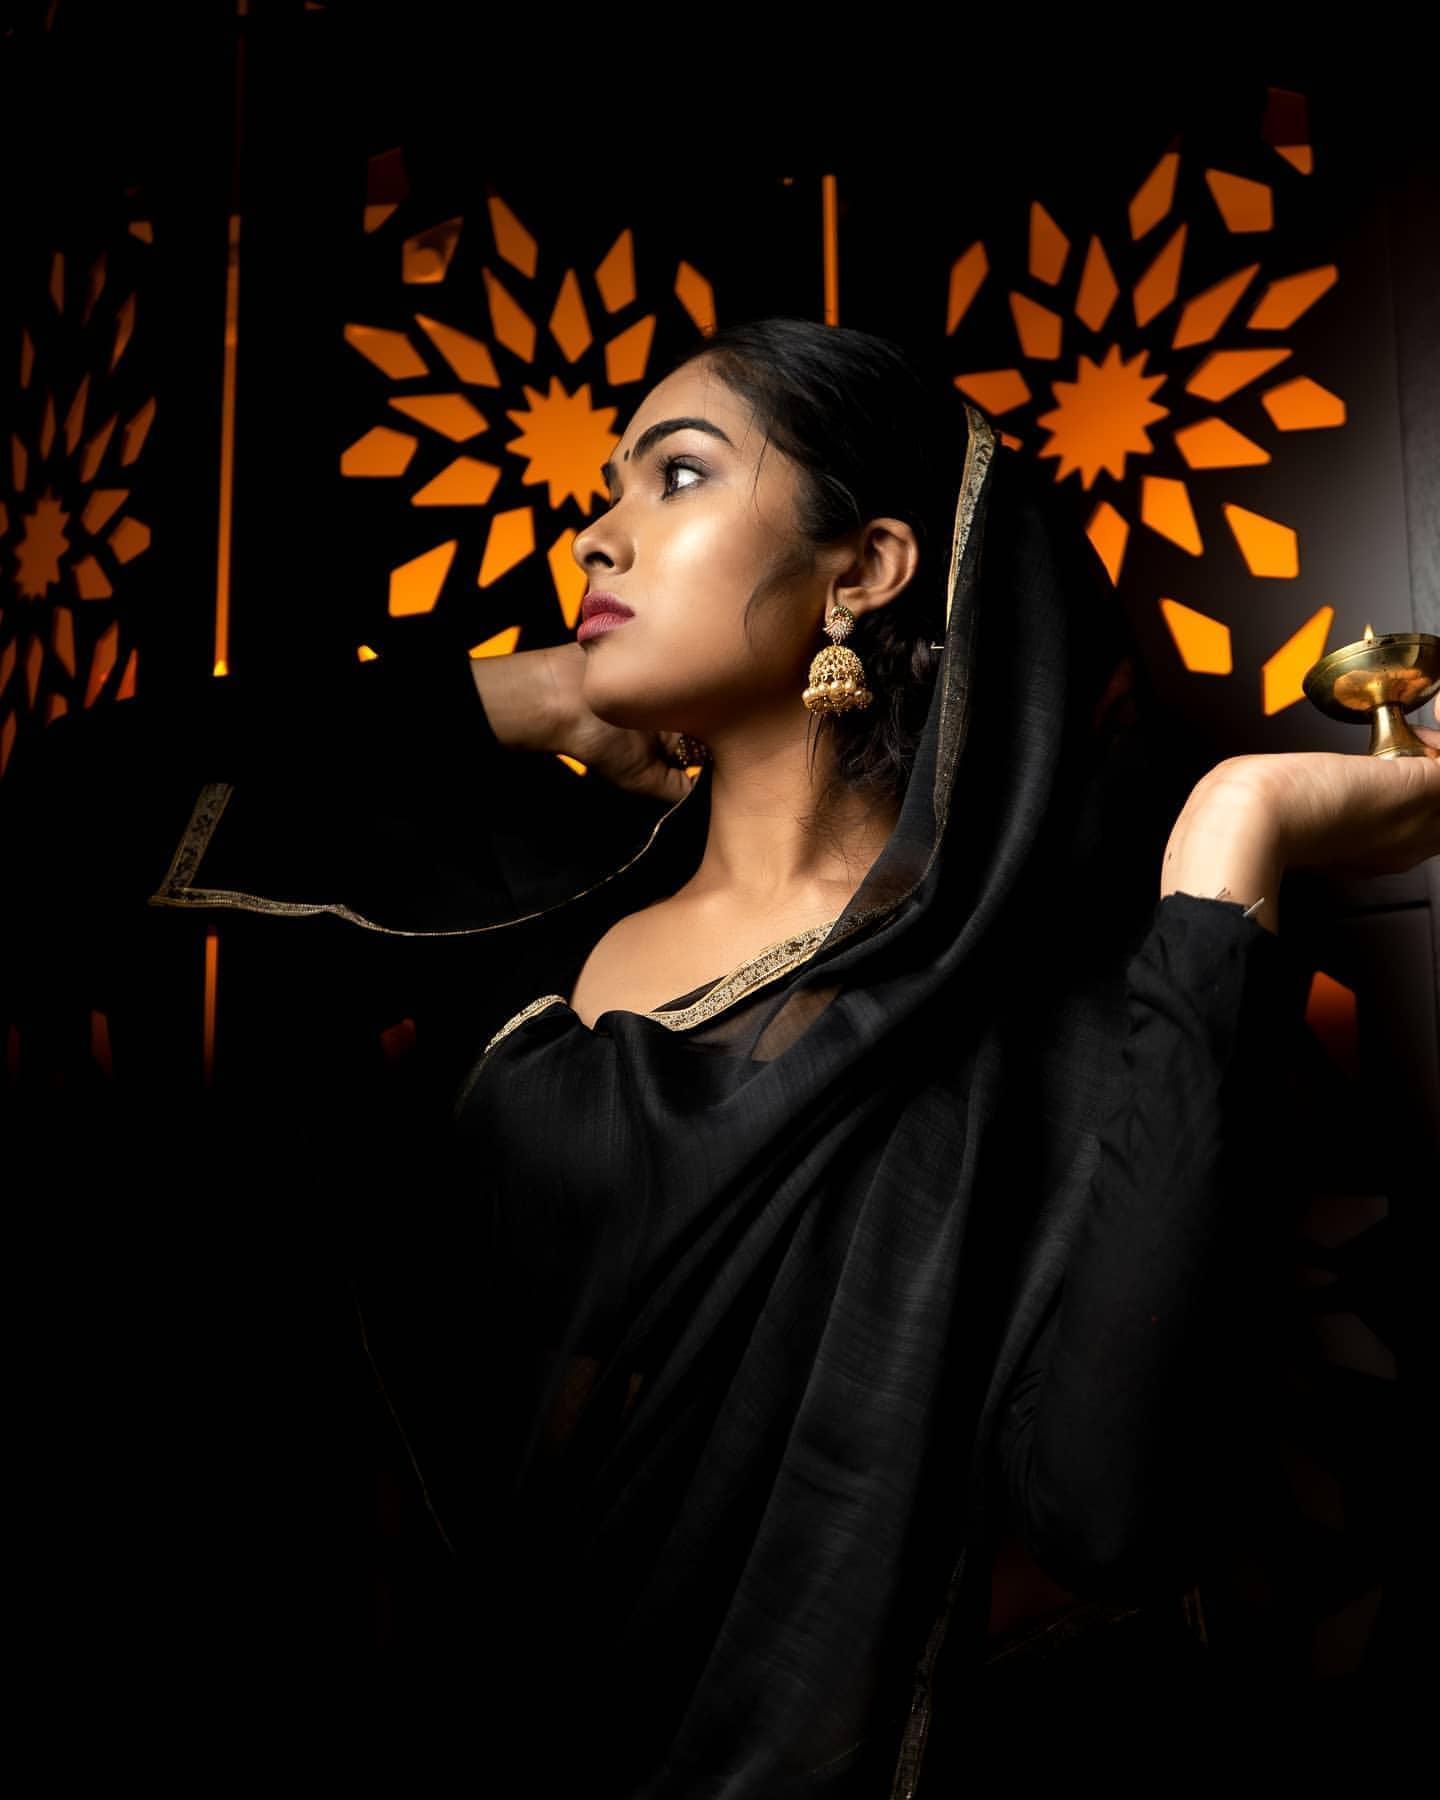 Bigg Boss Telugu 4 Divi : వారెవ్వా దివి.. సోషల్ మీడియాలో క్రేజు మామూలుగా లేదుగా.. Photo : Instagram